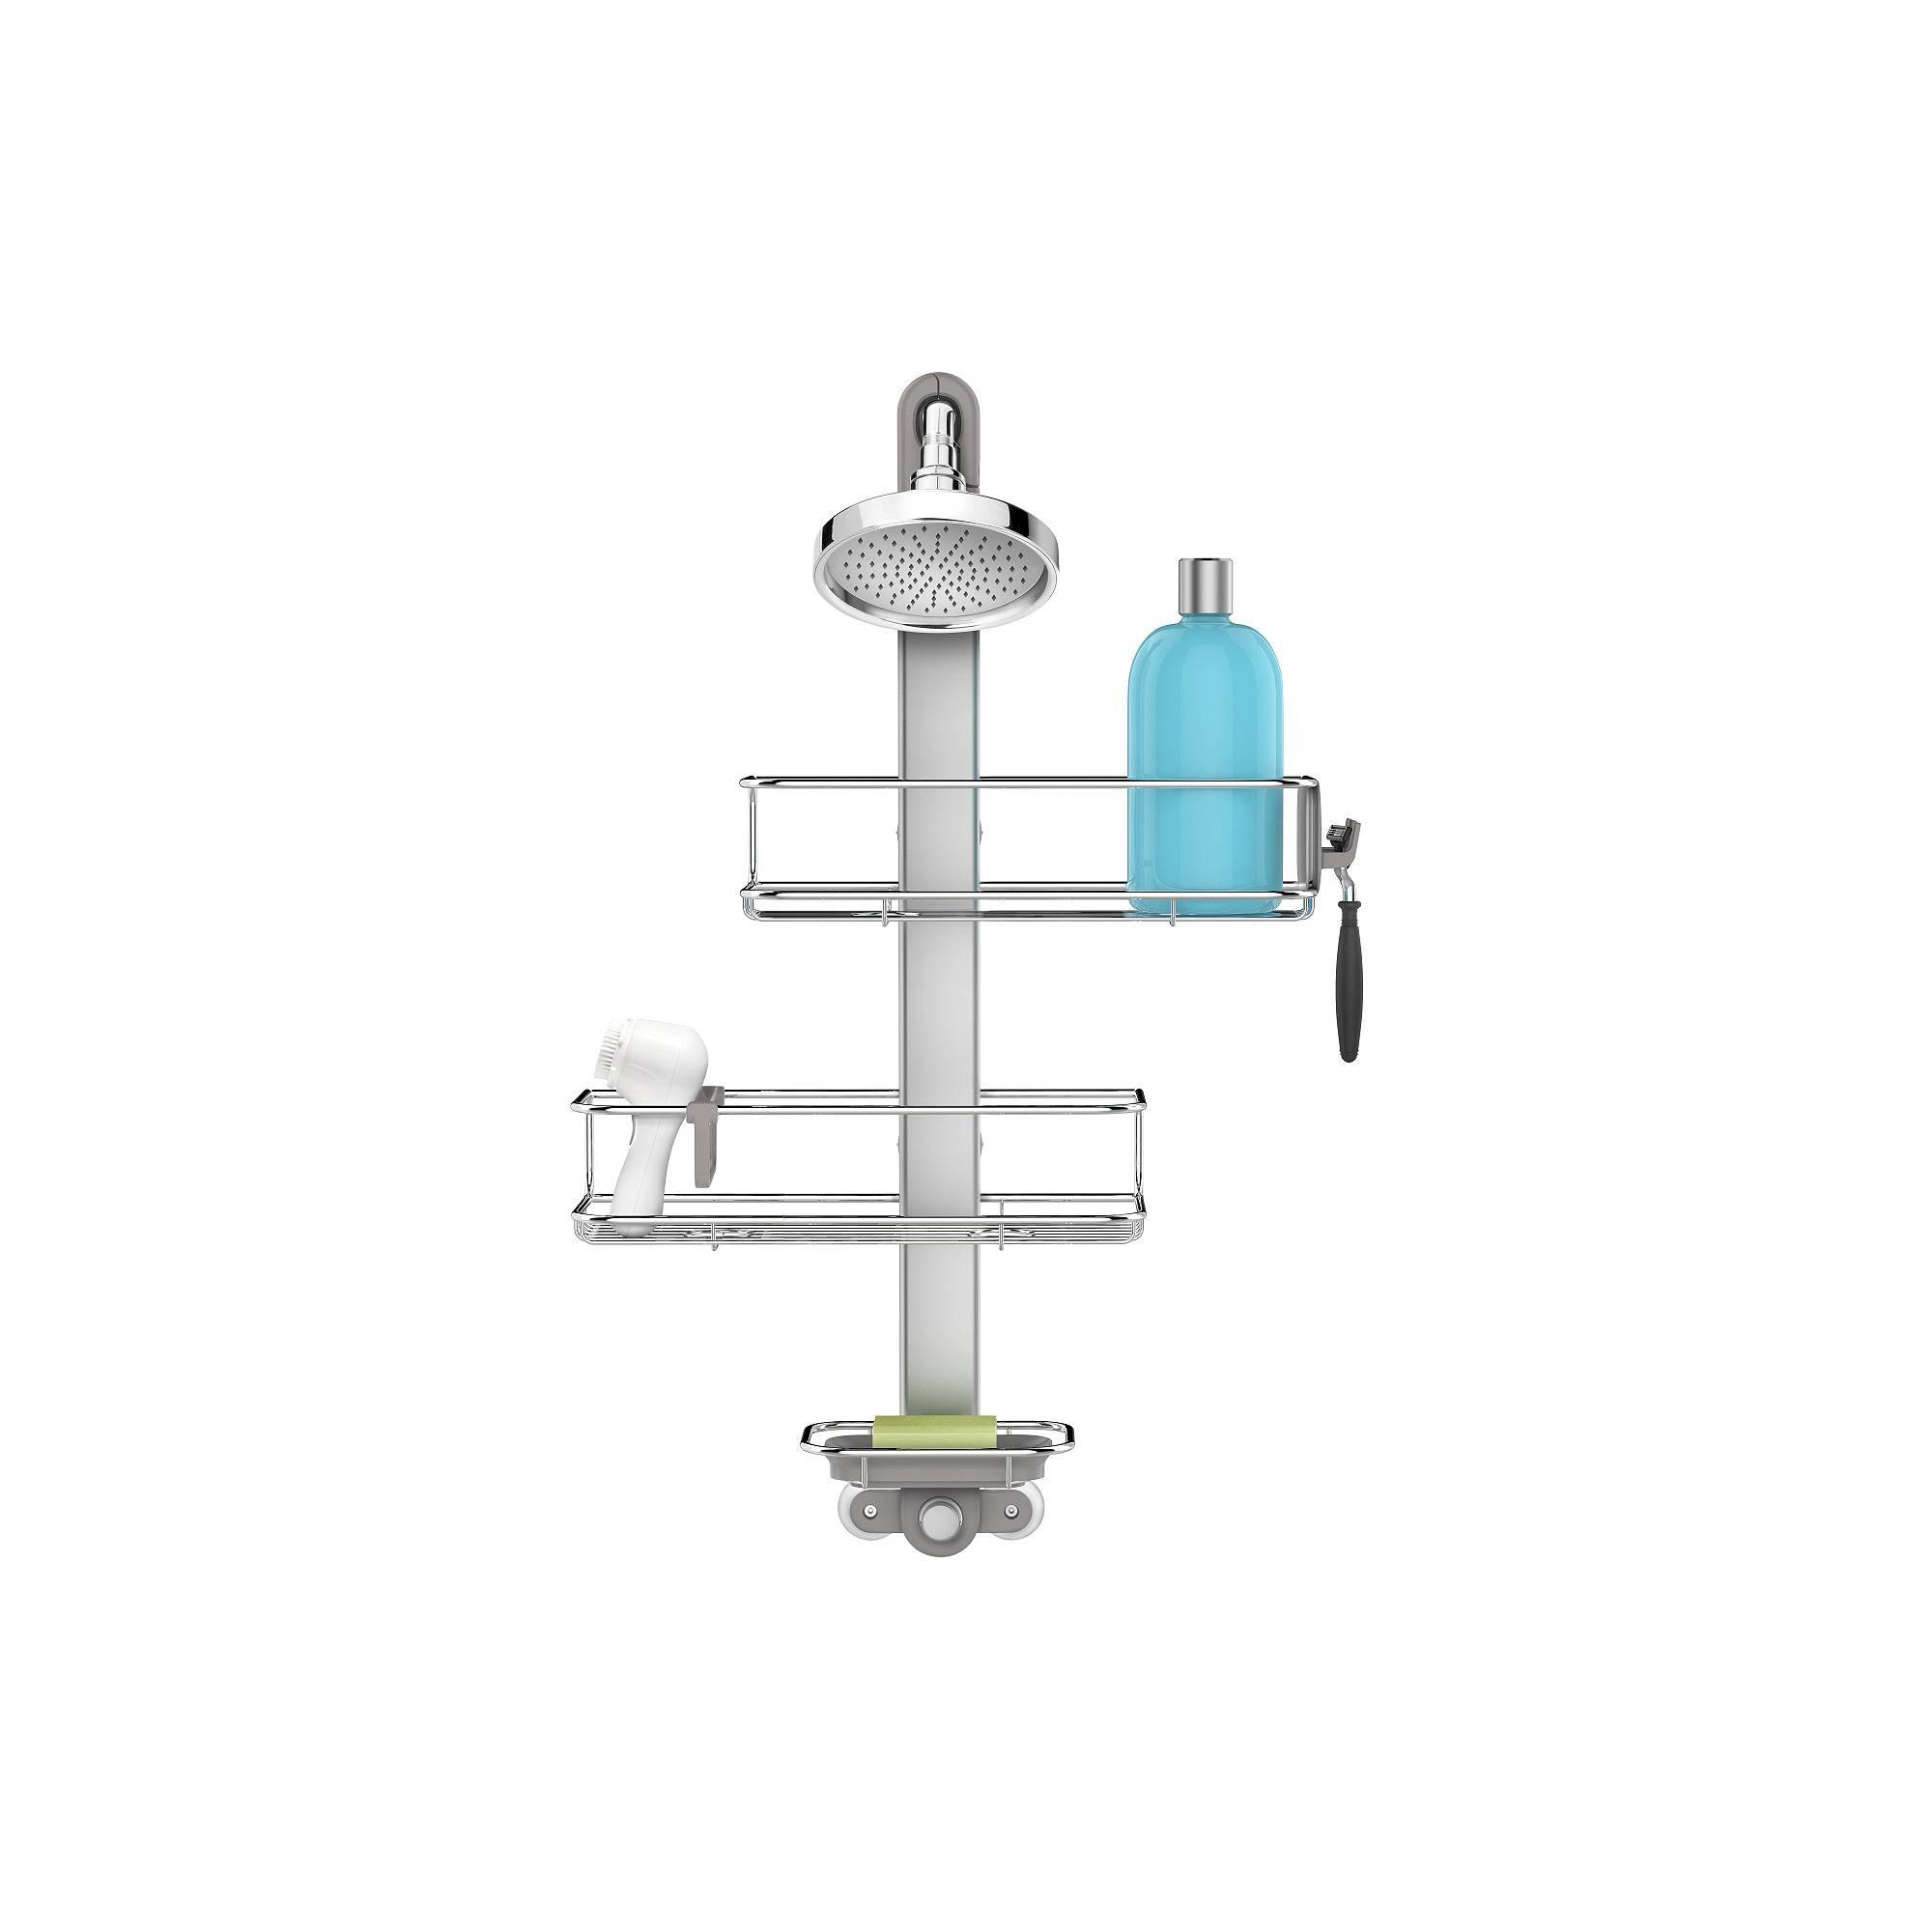 Adjustable Shower Caddy Simplehuman Studio - Target - $29.99